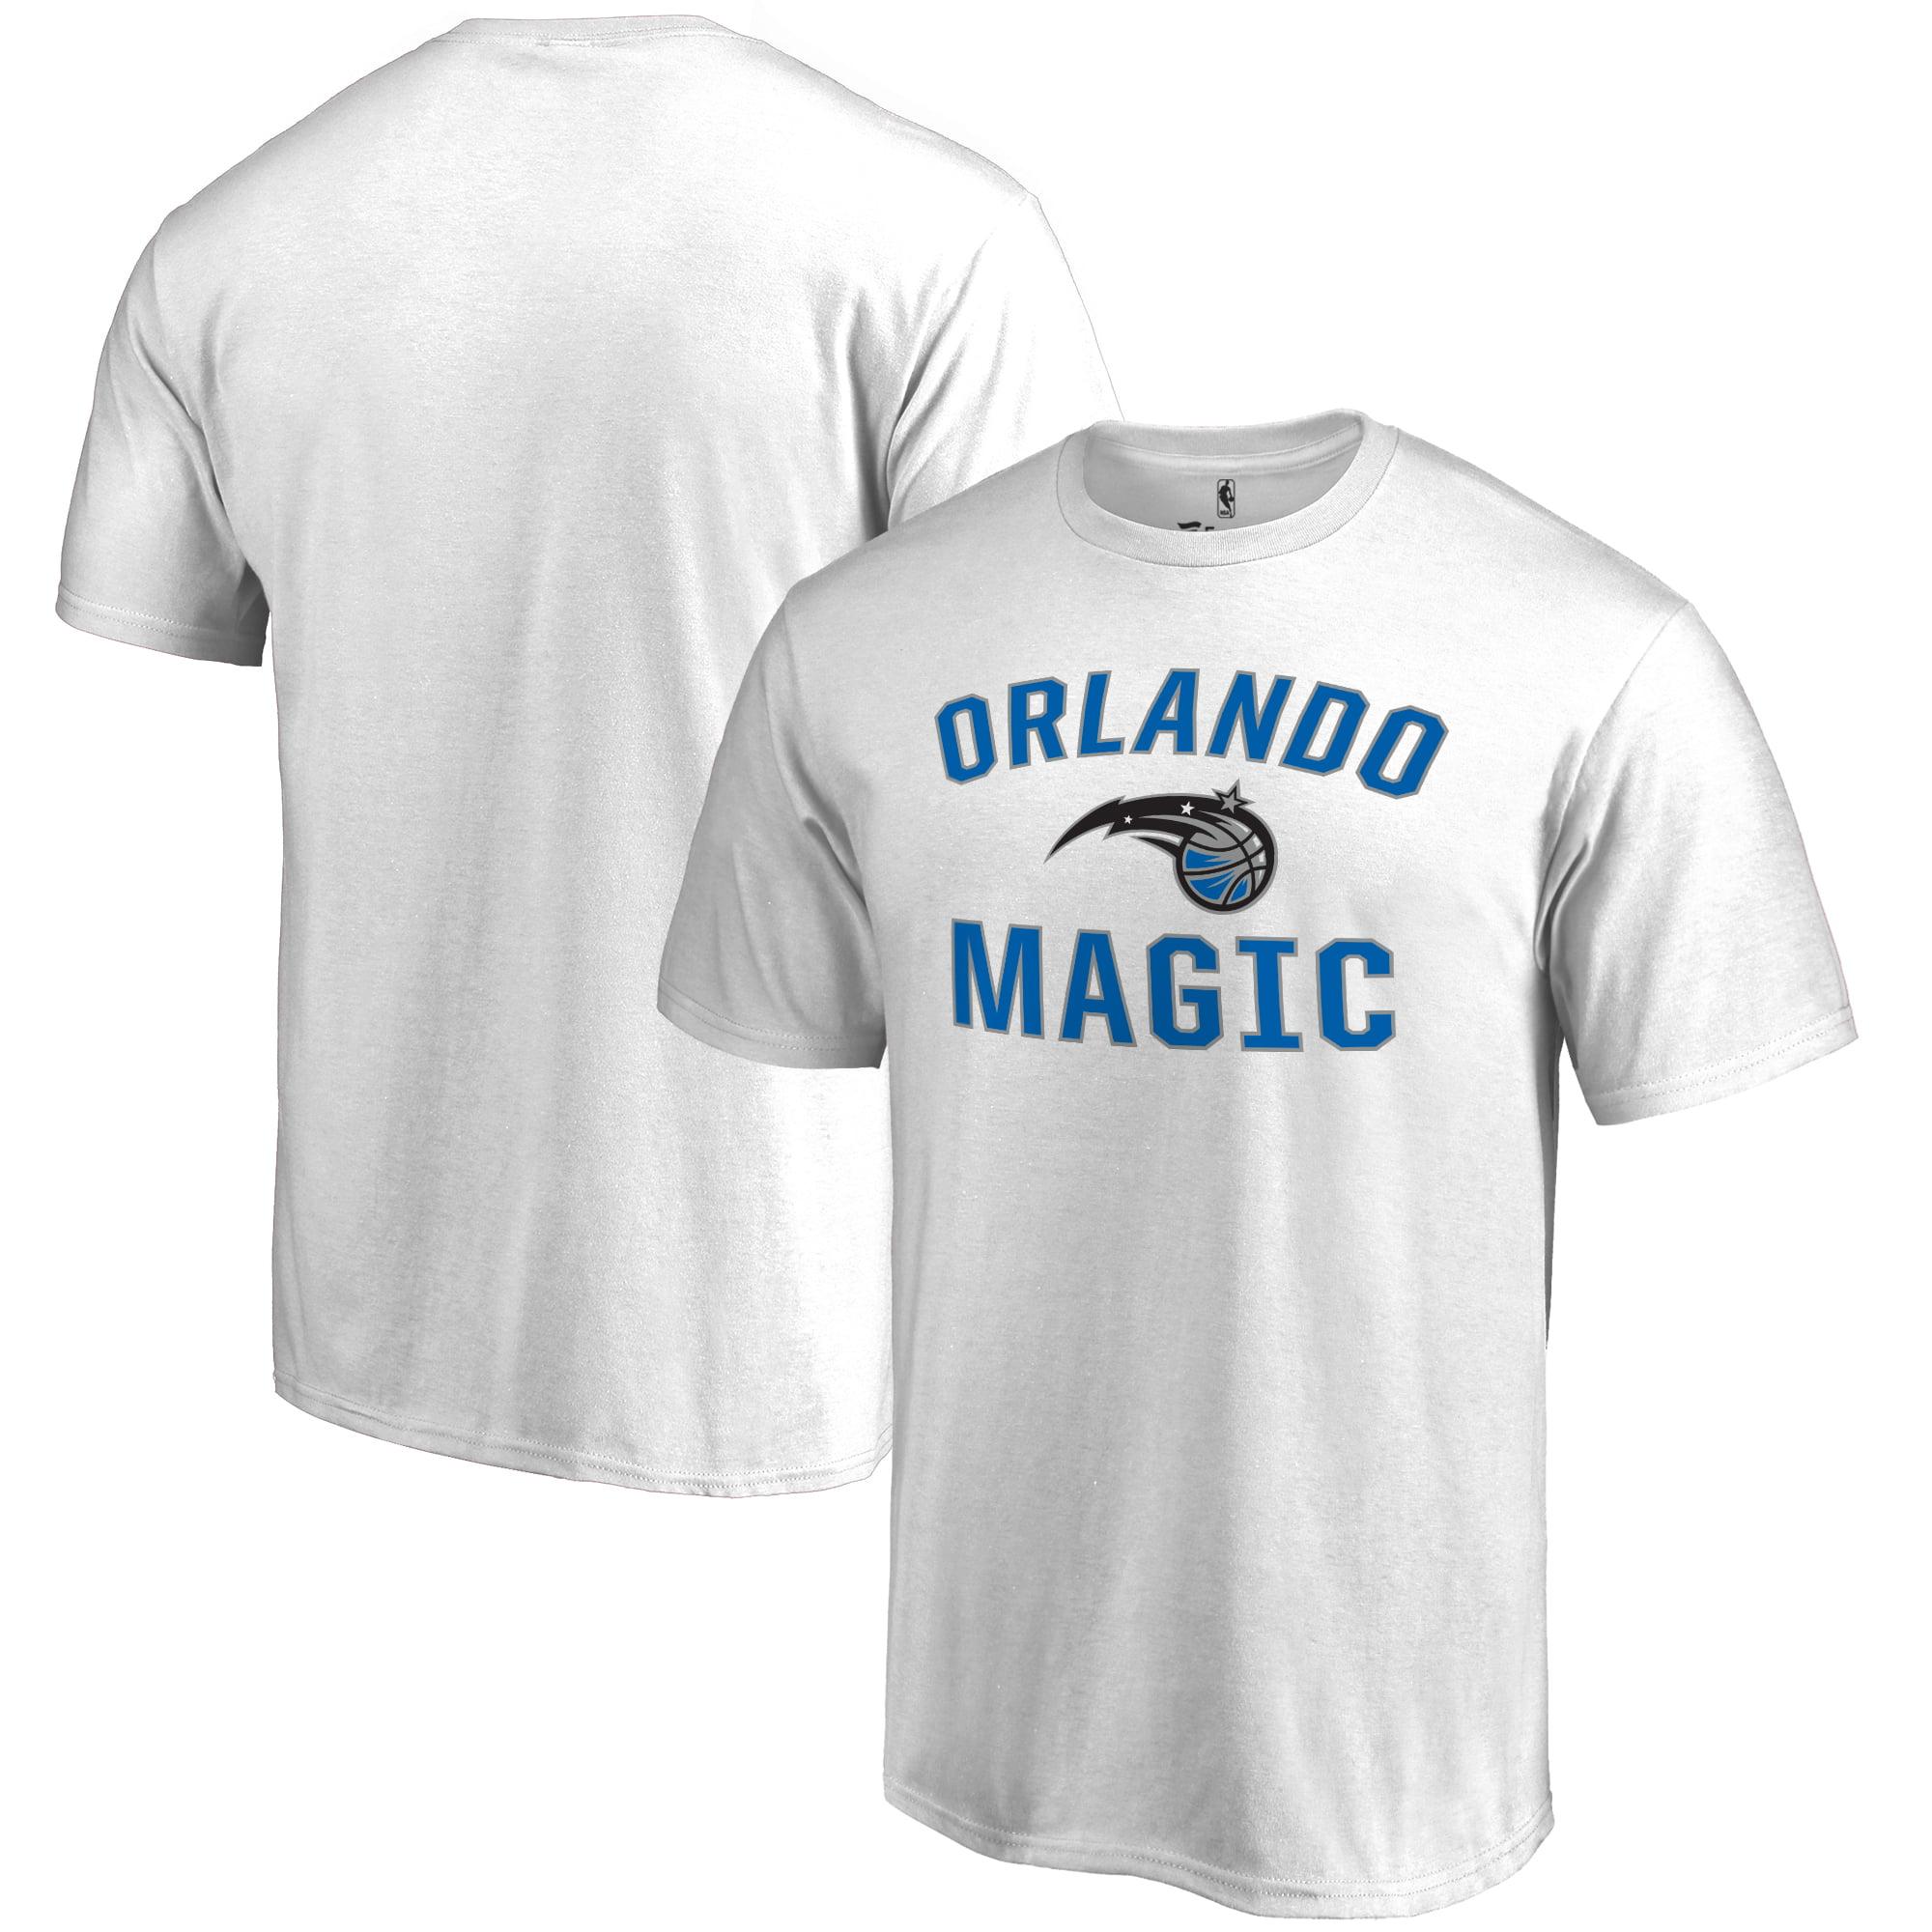 Orlando Magic Big & Tall Victory Arch T-Shirt - White